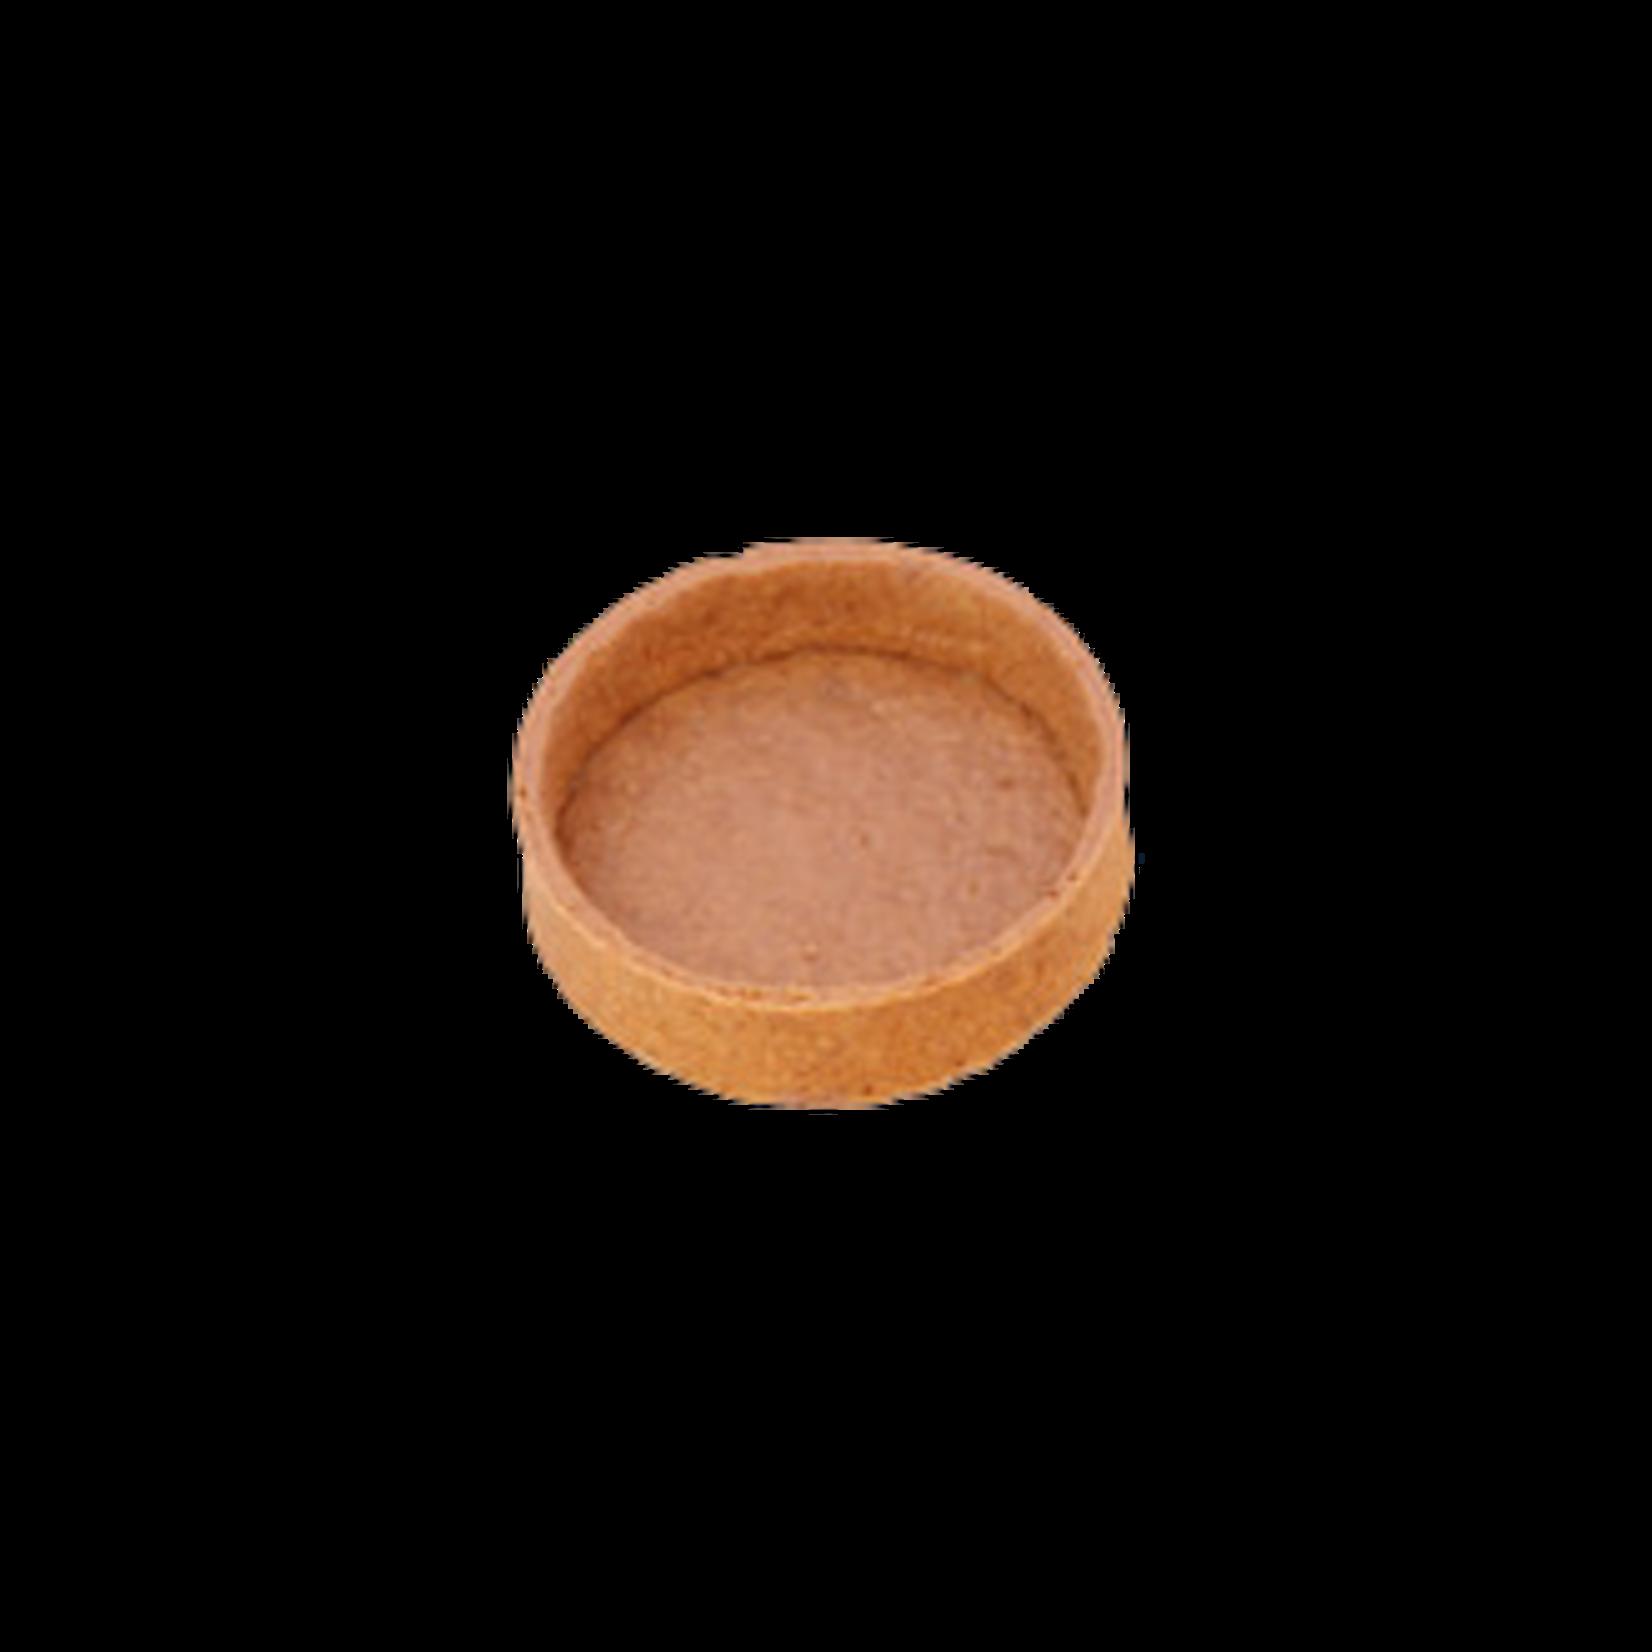 Delifrance Delifrance - Tart shell, Graham round - 3'' (60ct), 79030